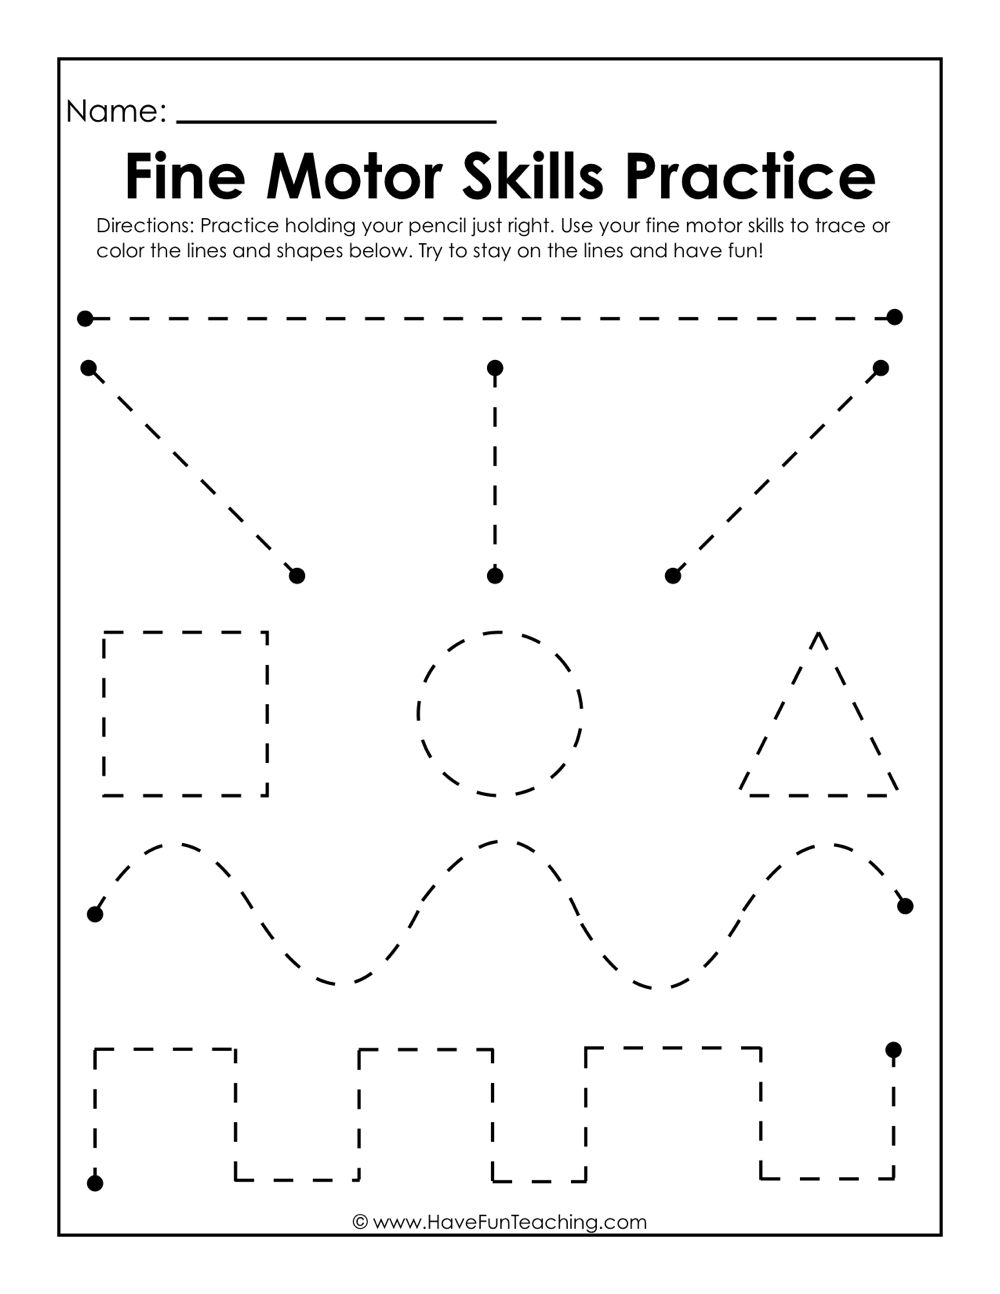 Fine Motor Skills Practice Worksheet | Writing Practice